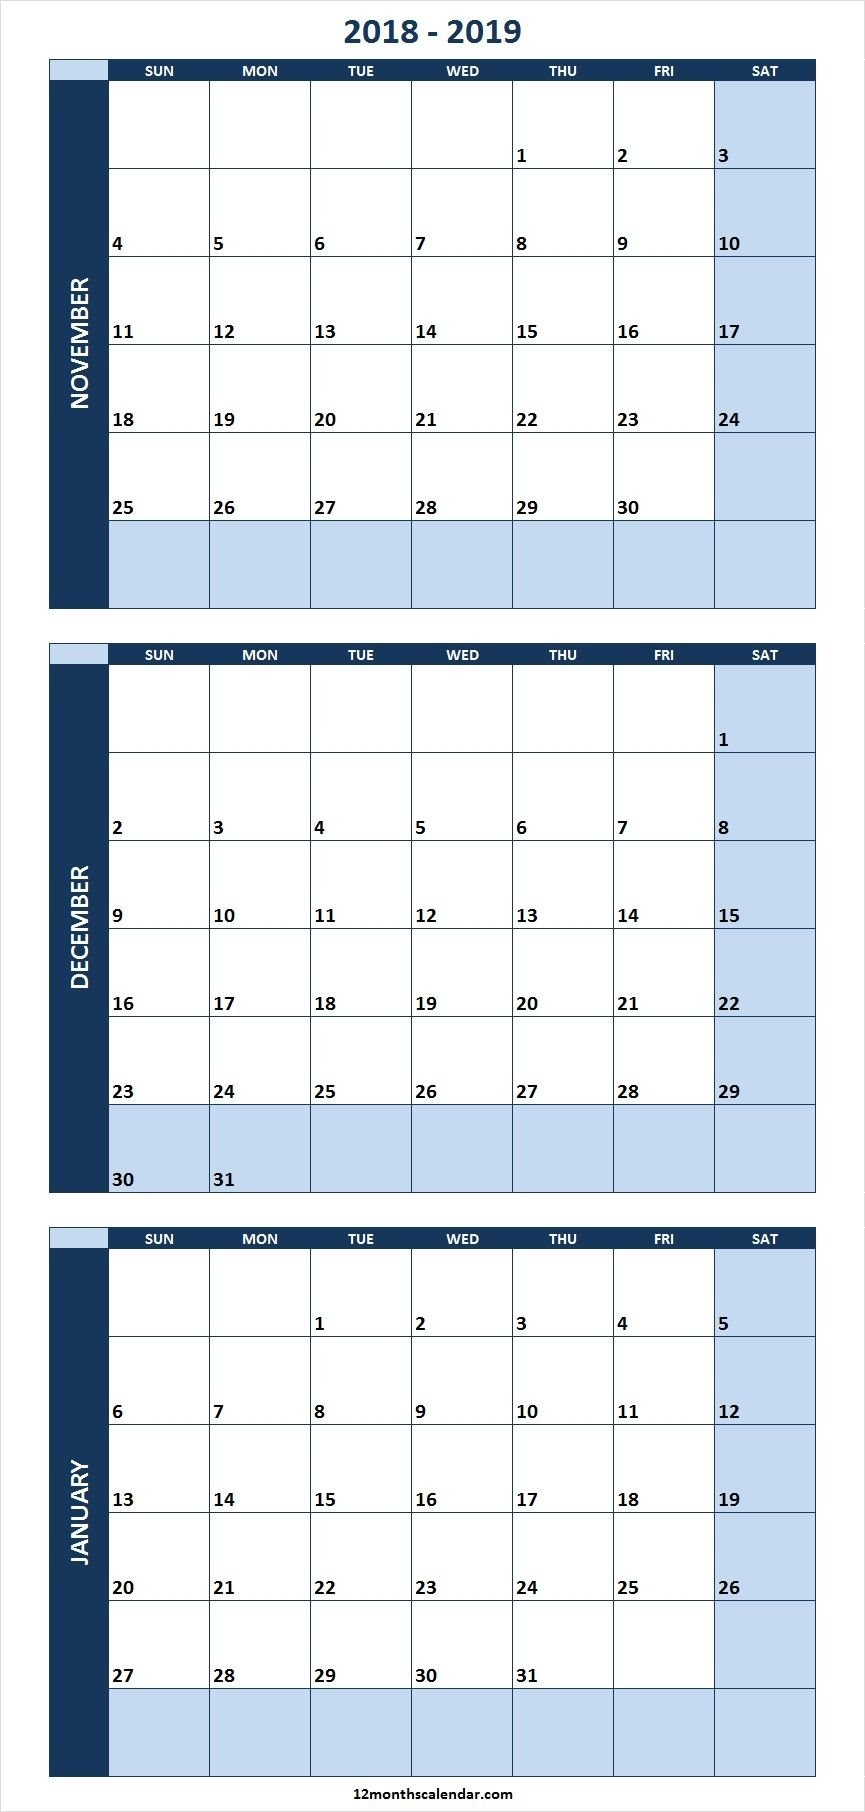 November December 2018 January 2019 Calendar Template Excel Editable Calendar 2019 Excel Editable